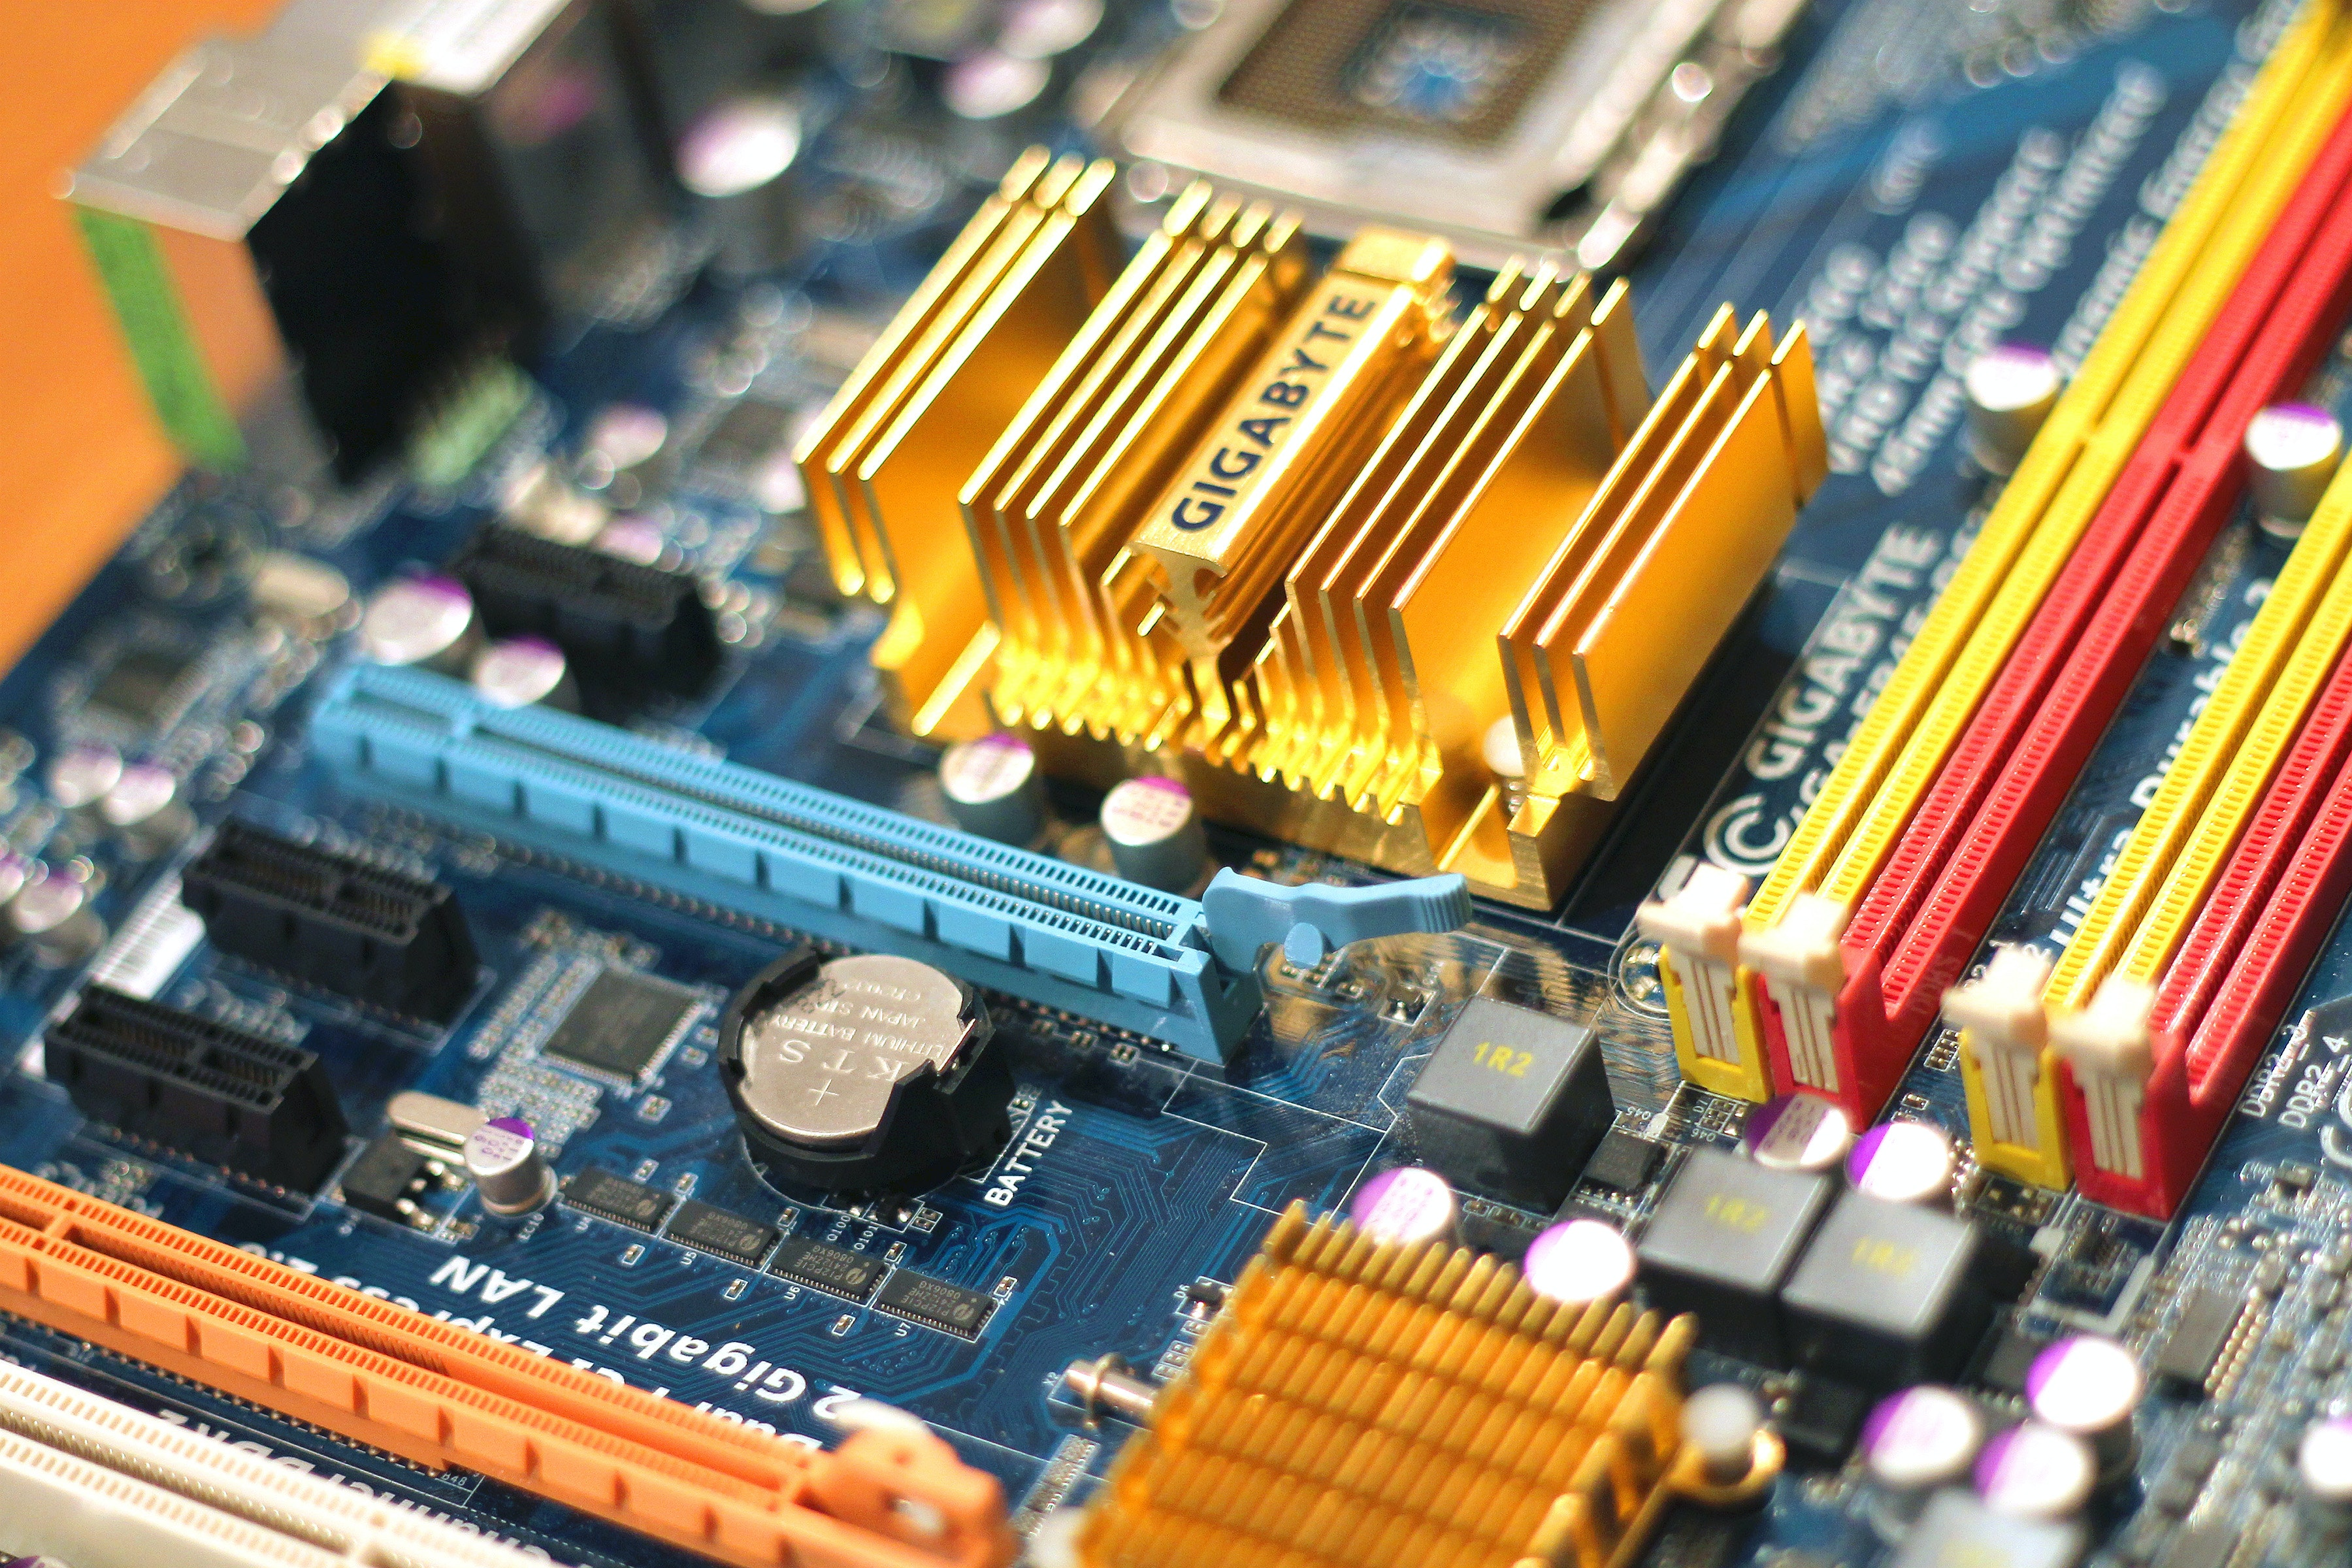 personal-computer-motherboard-4316.jpg